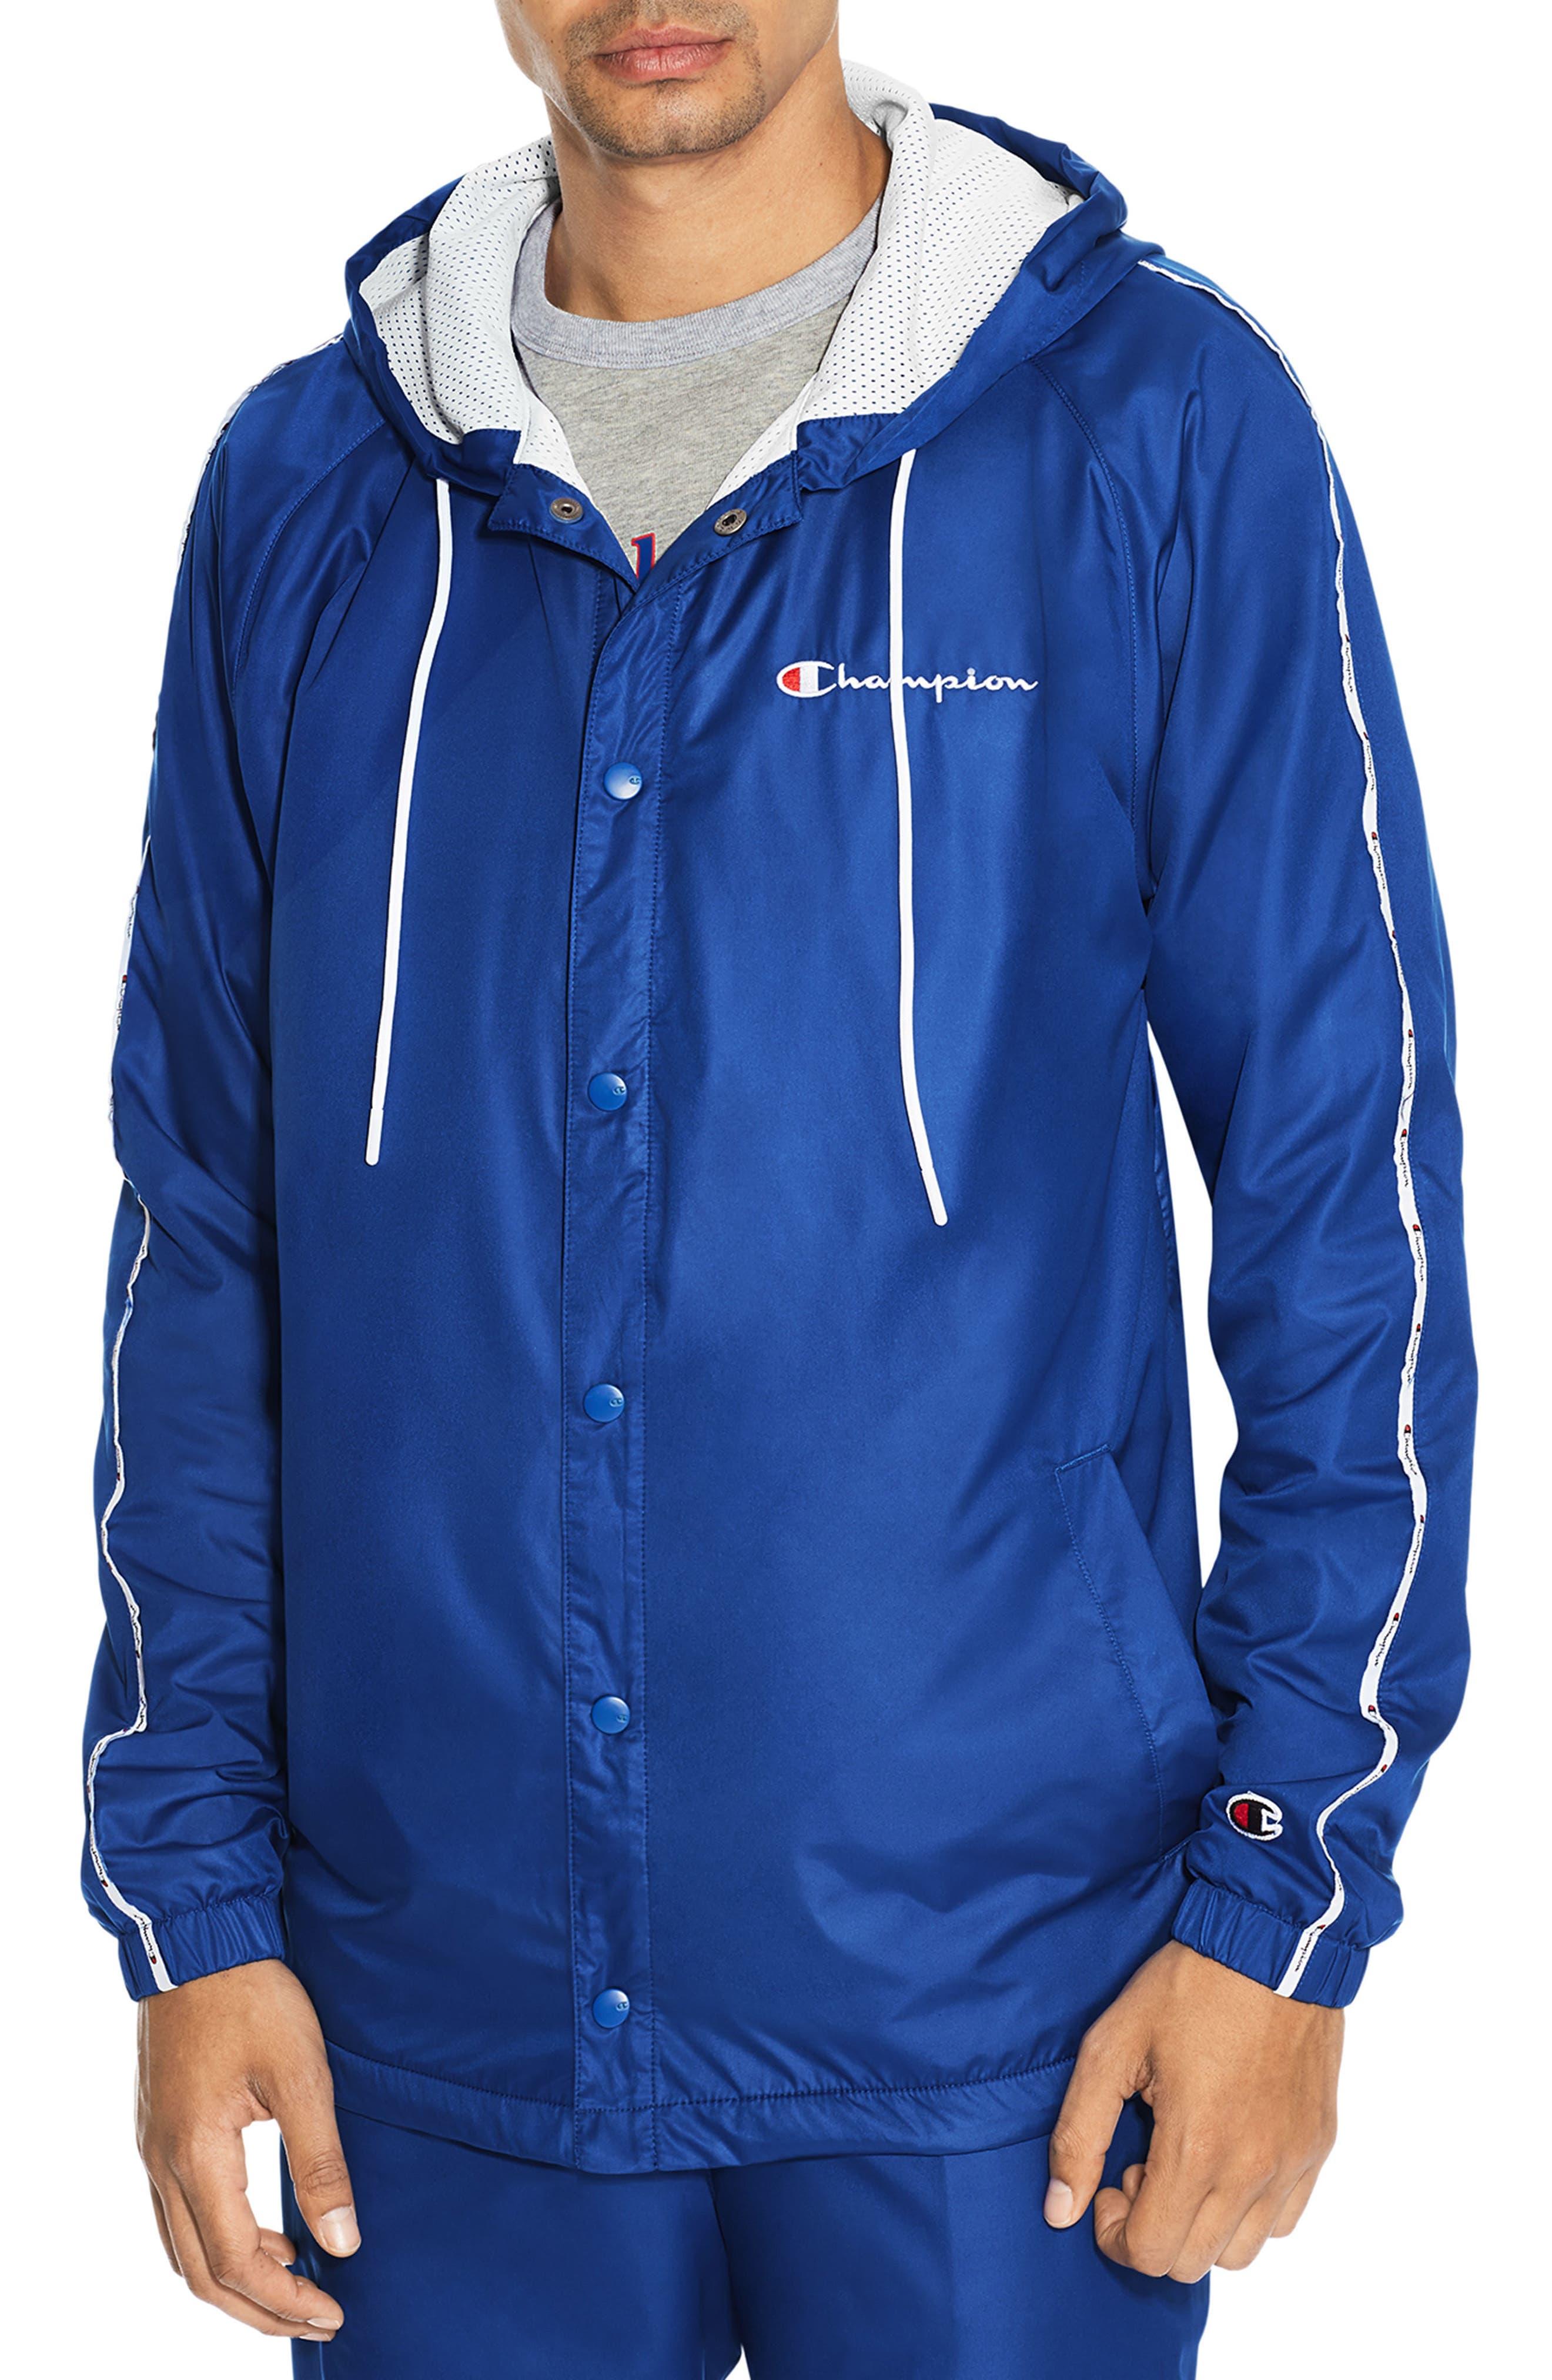 Main Image - Champion Satin Hooded Jacket